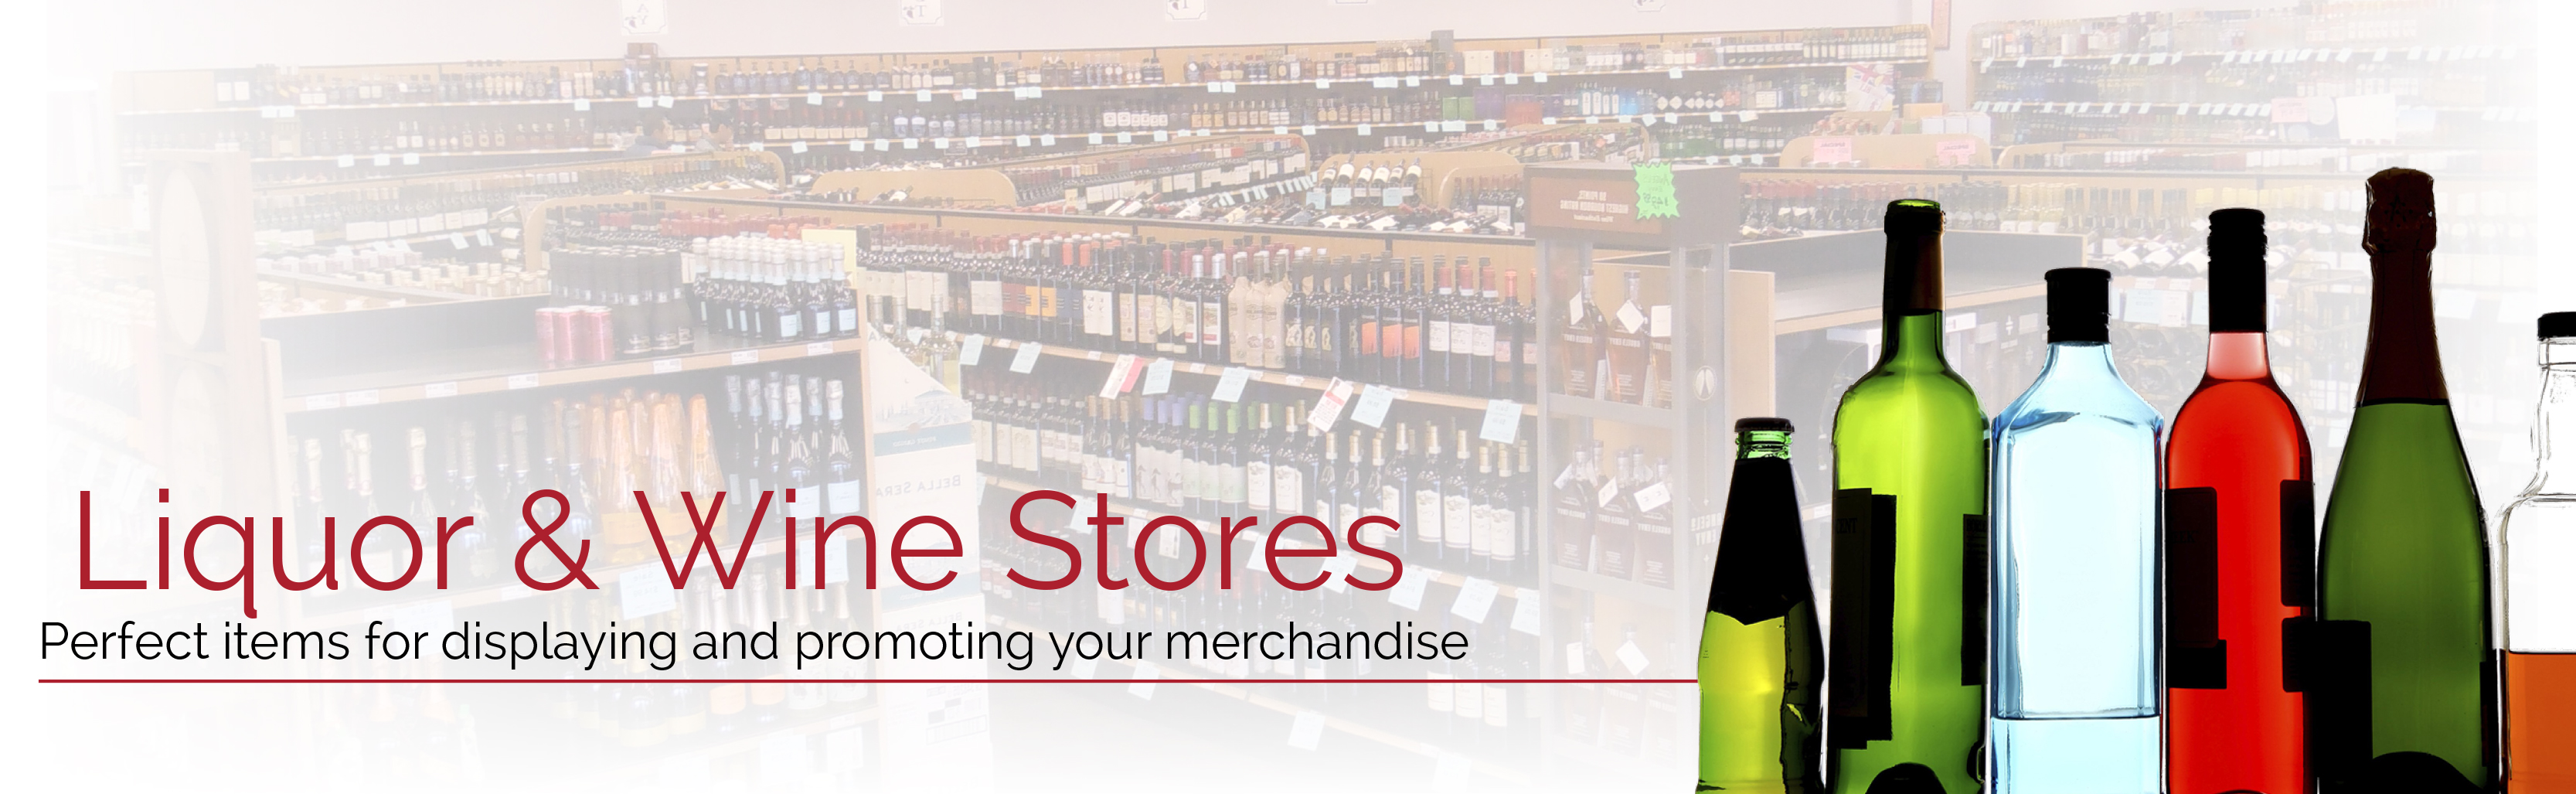 Liquor & Wine Stores